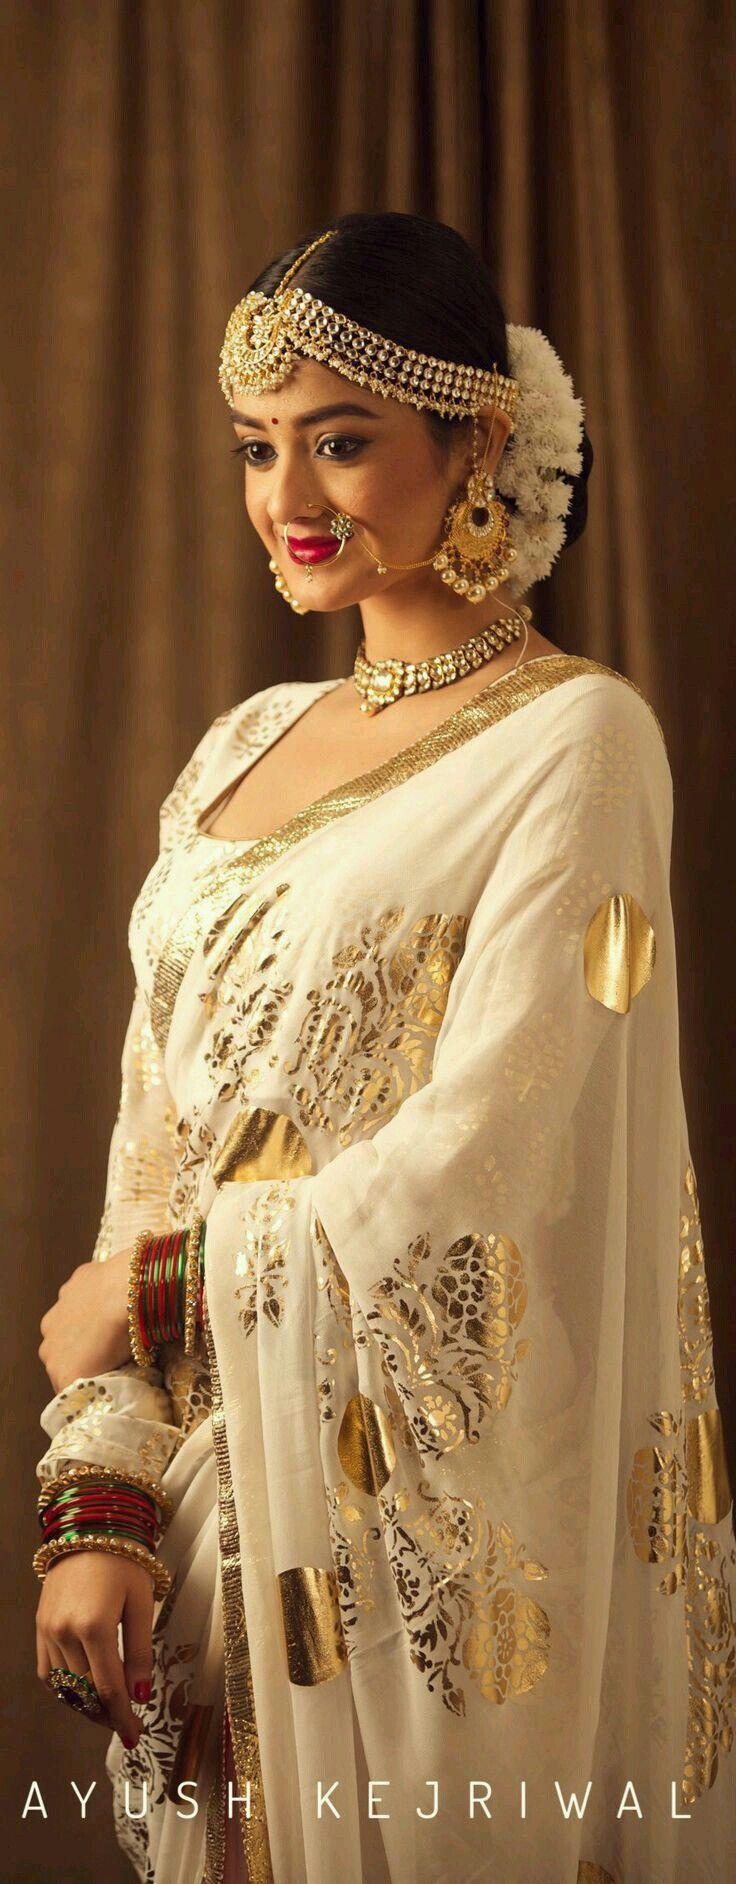 S fatima beauty pinterest saree punjabi bride and bengali bride